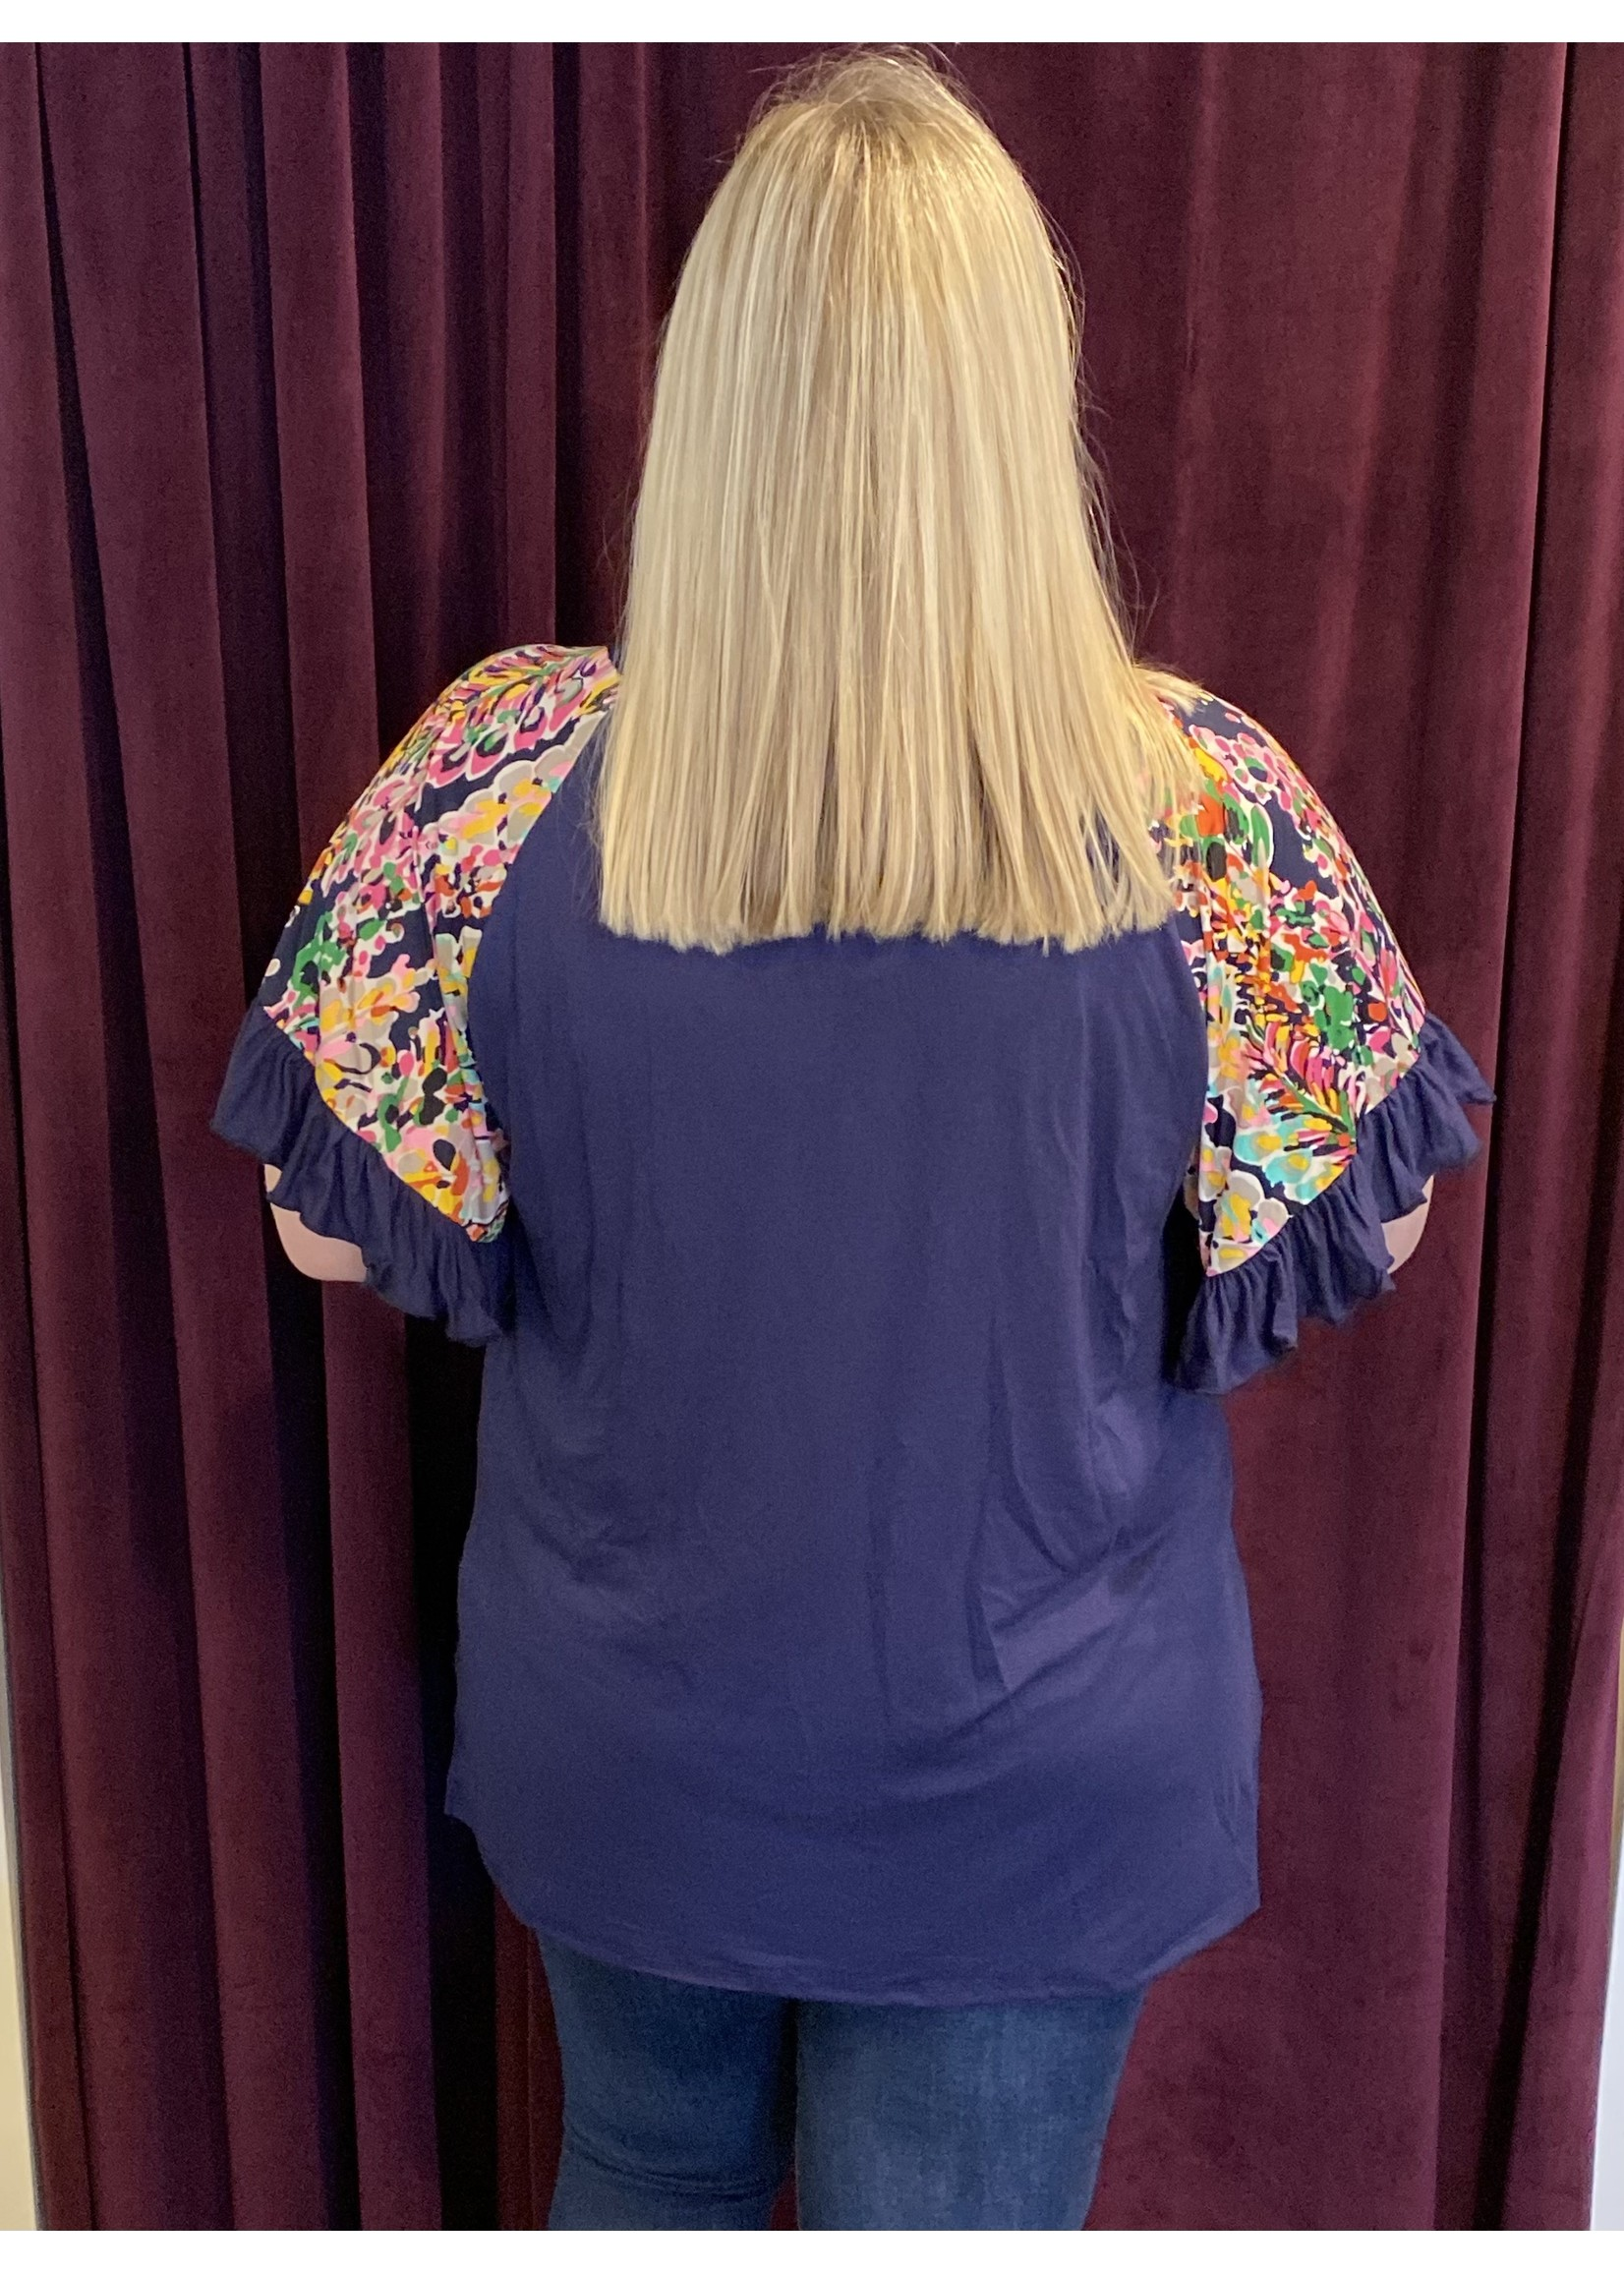 Floral Bell Sleeve Top - Plus